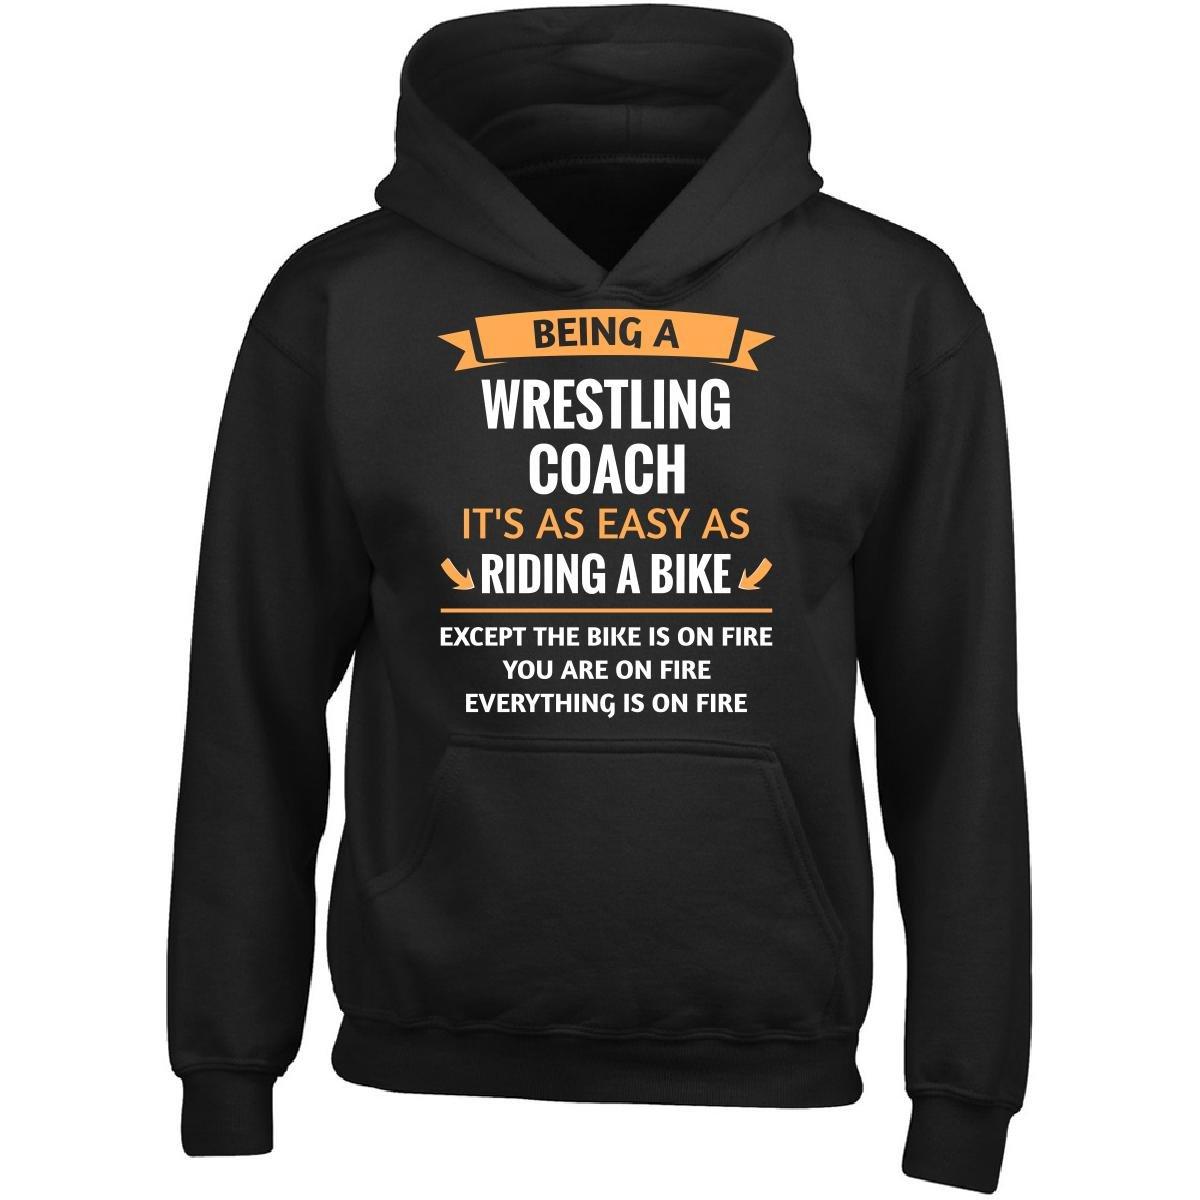 This Gift Rocks ! Funny Wrestling Coach Design Gift - Girl Girls Hoodie Kids L Black